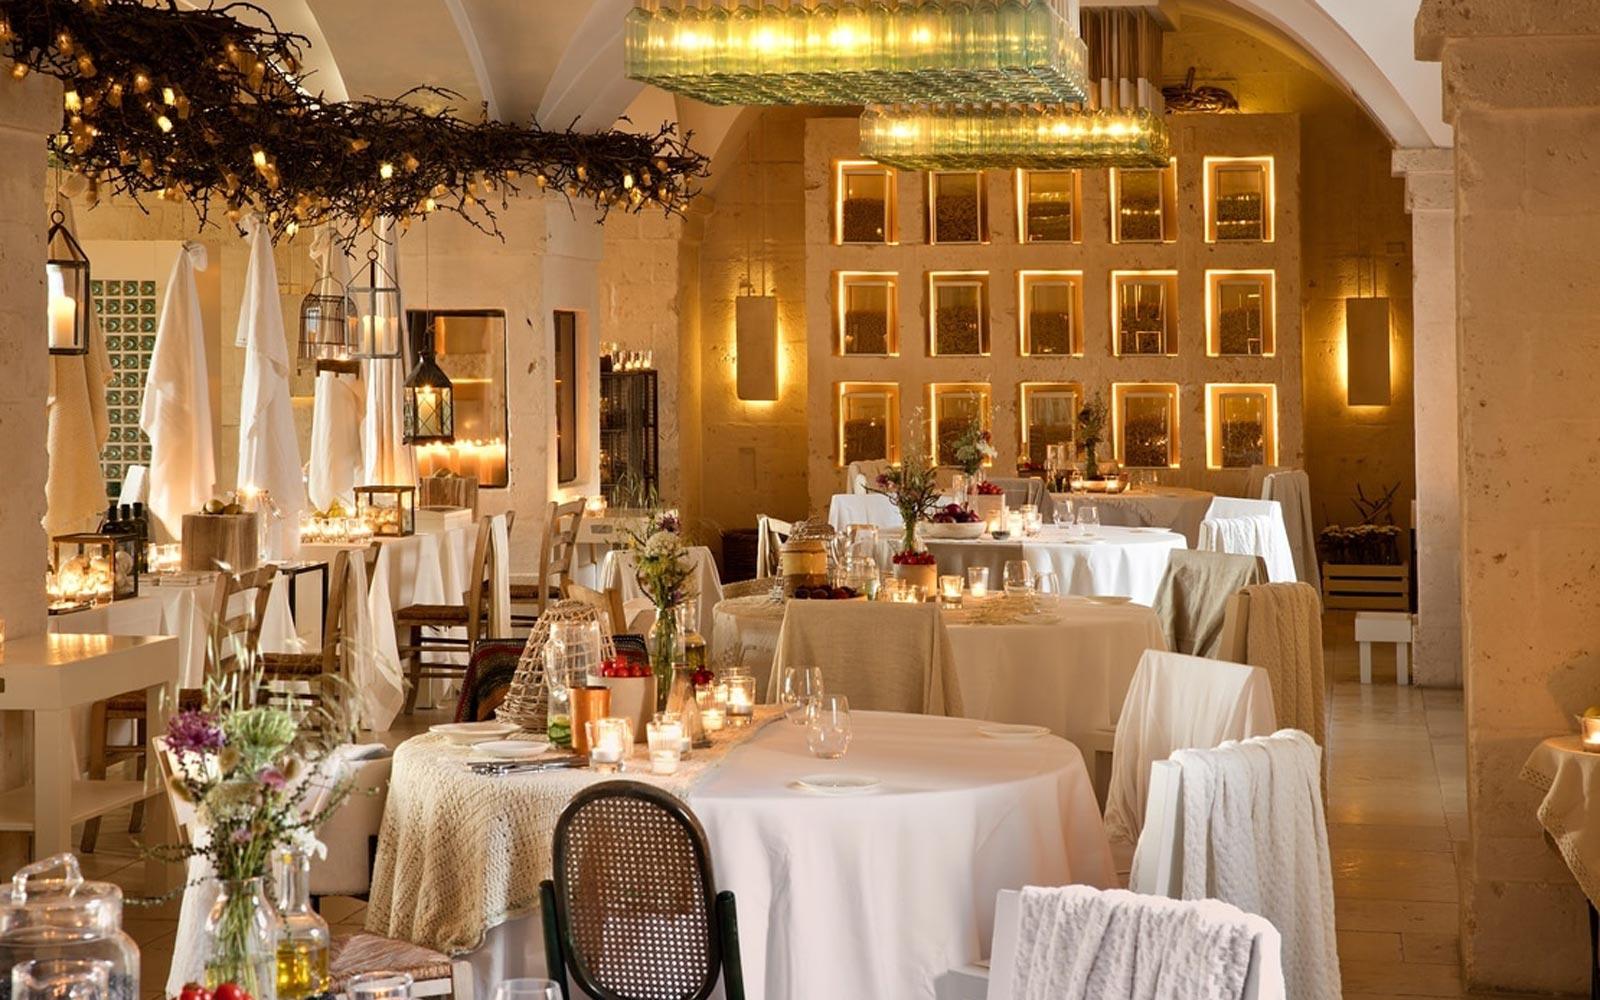 Restaurant at the Borgo Egnazia